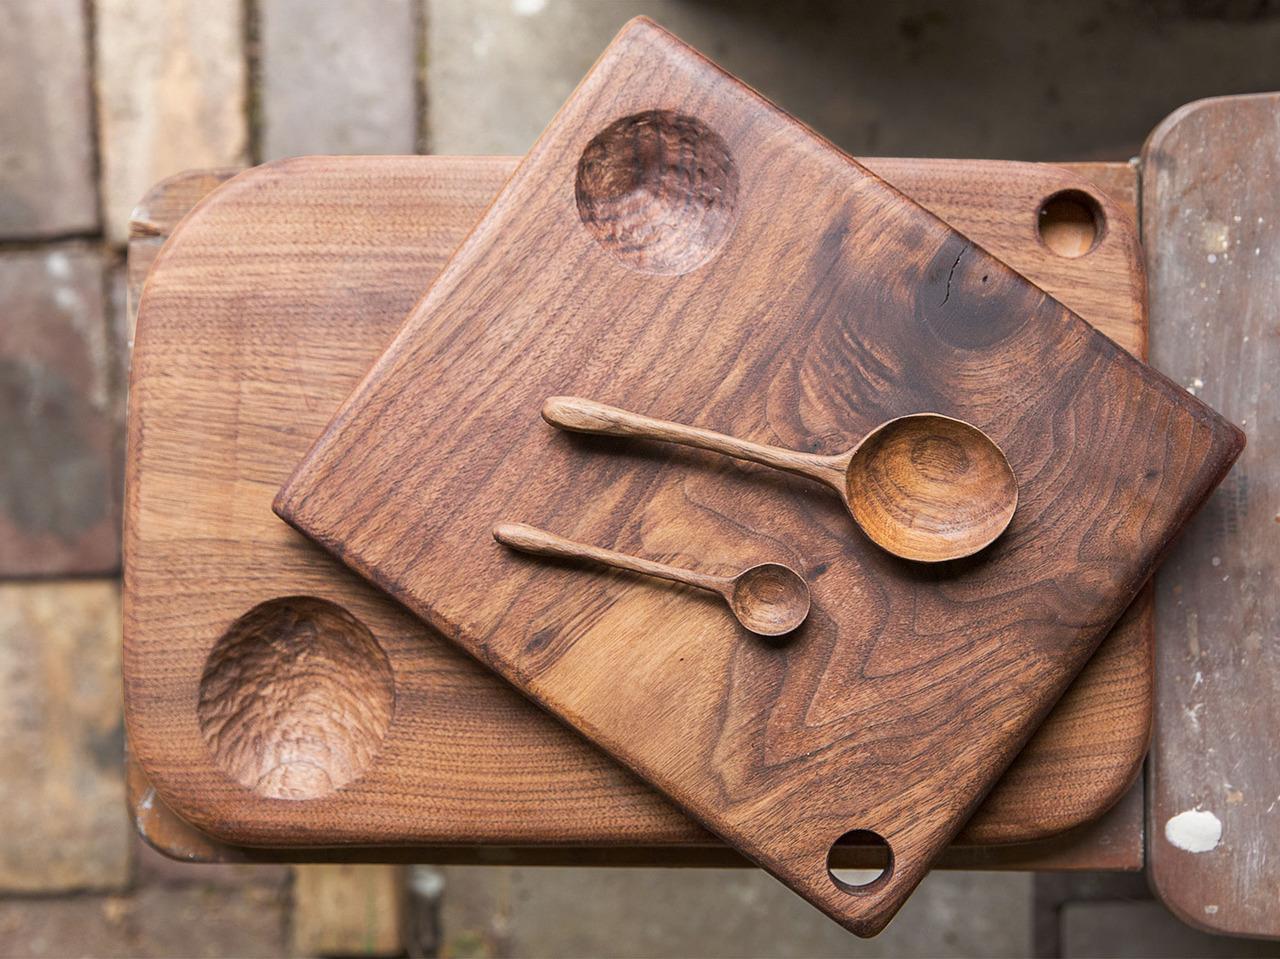 Hand Carved Walnut Serving Boards Hand Carved Walnut